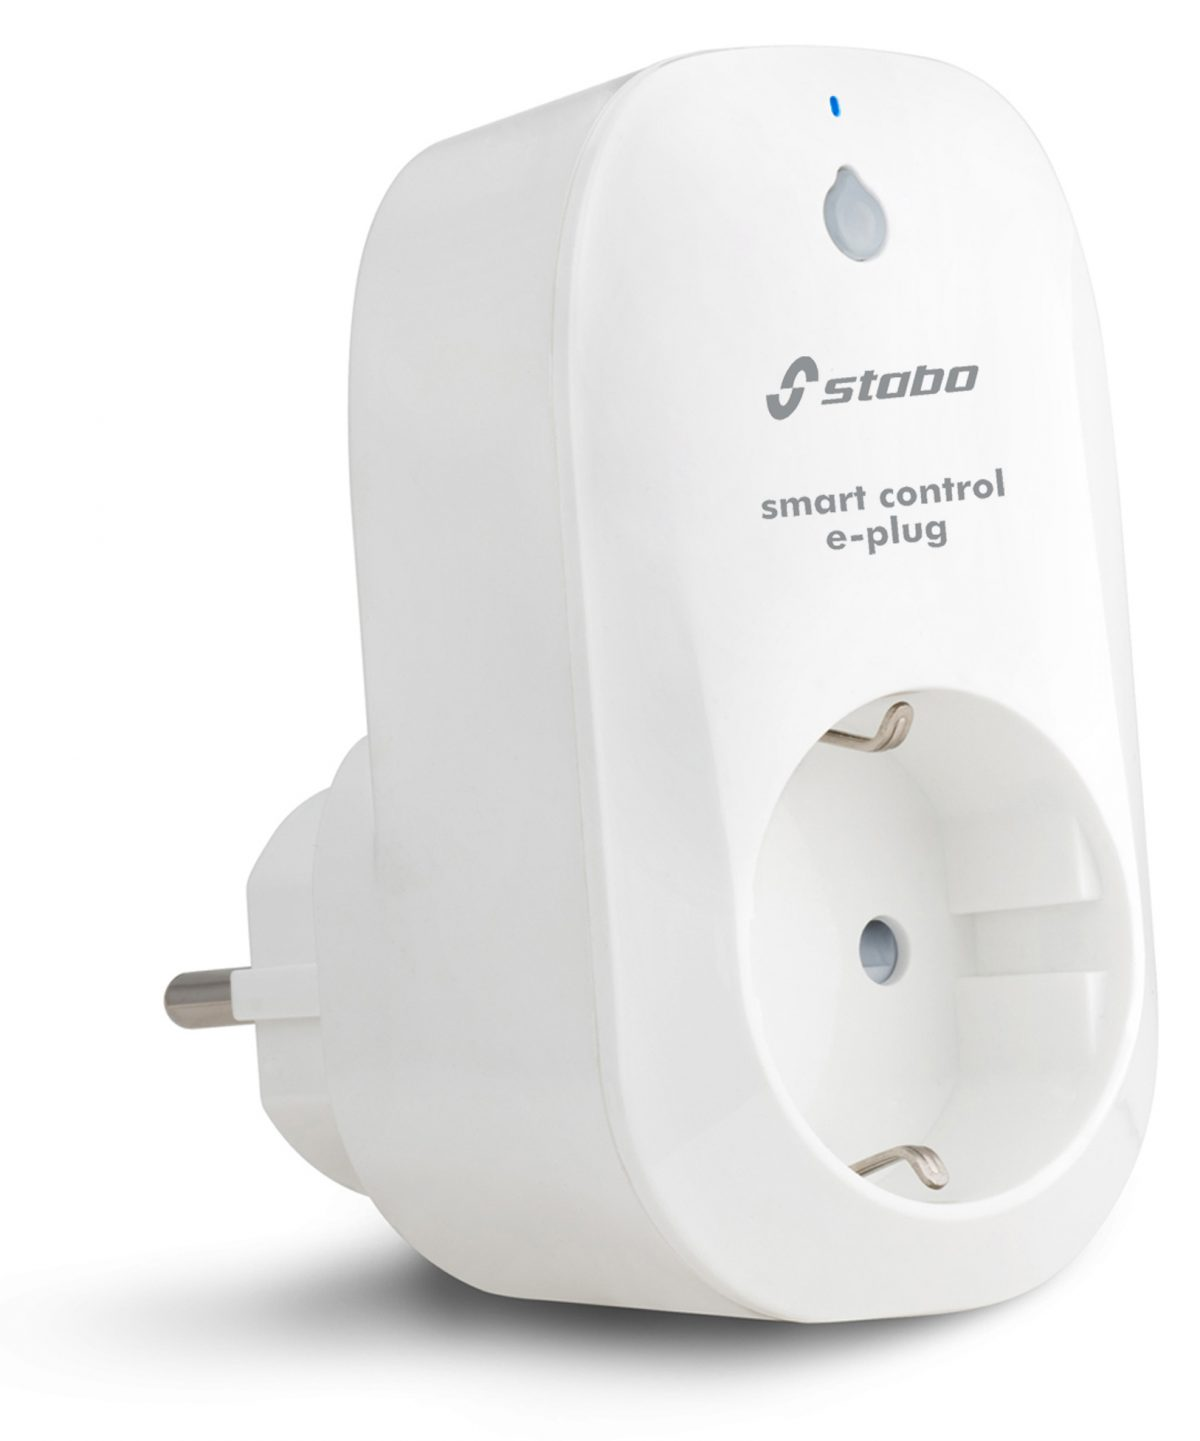 smart_control_e-plug